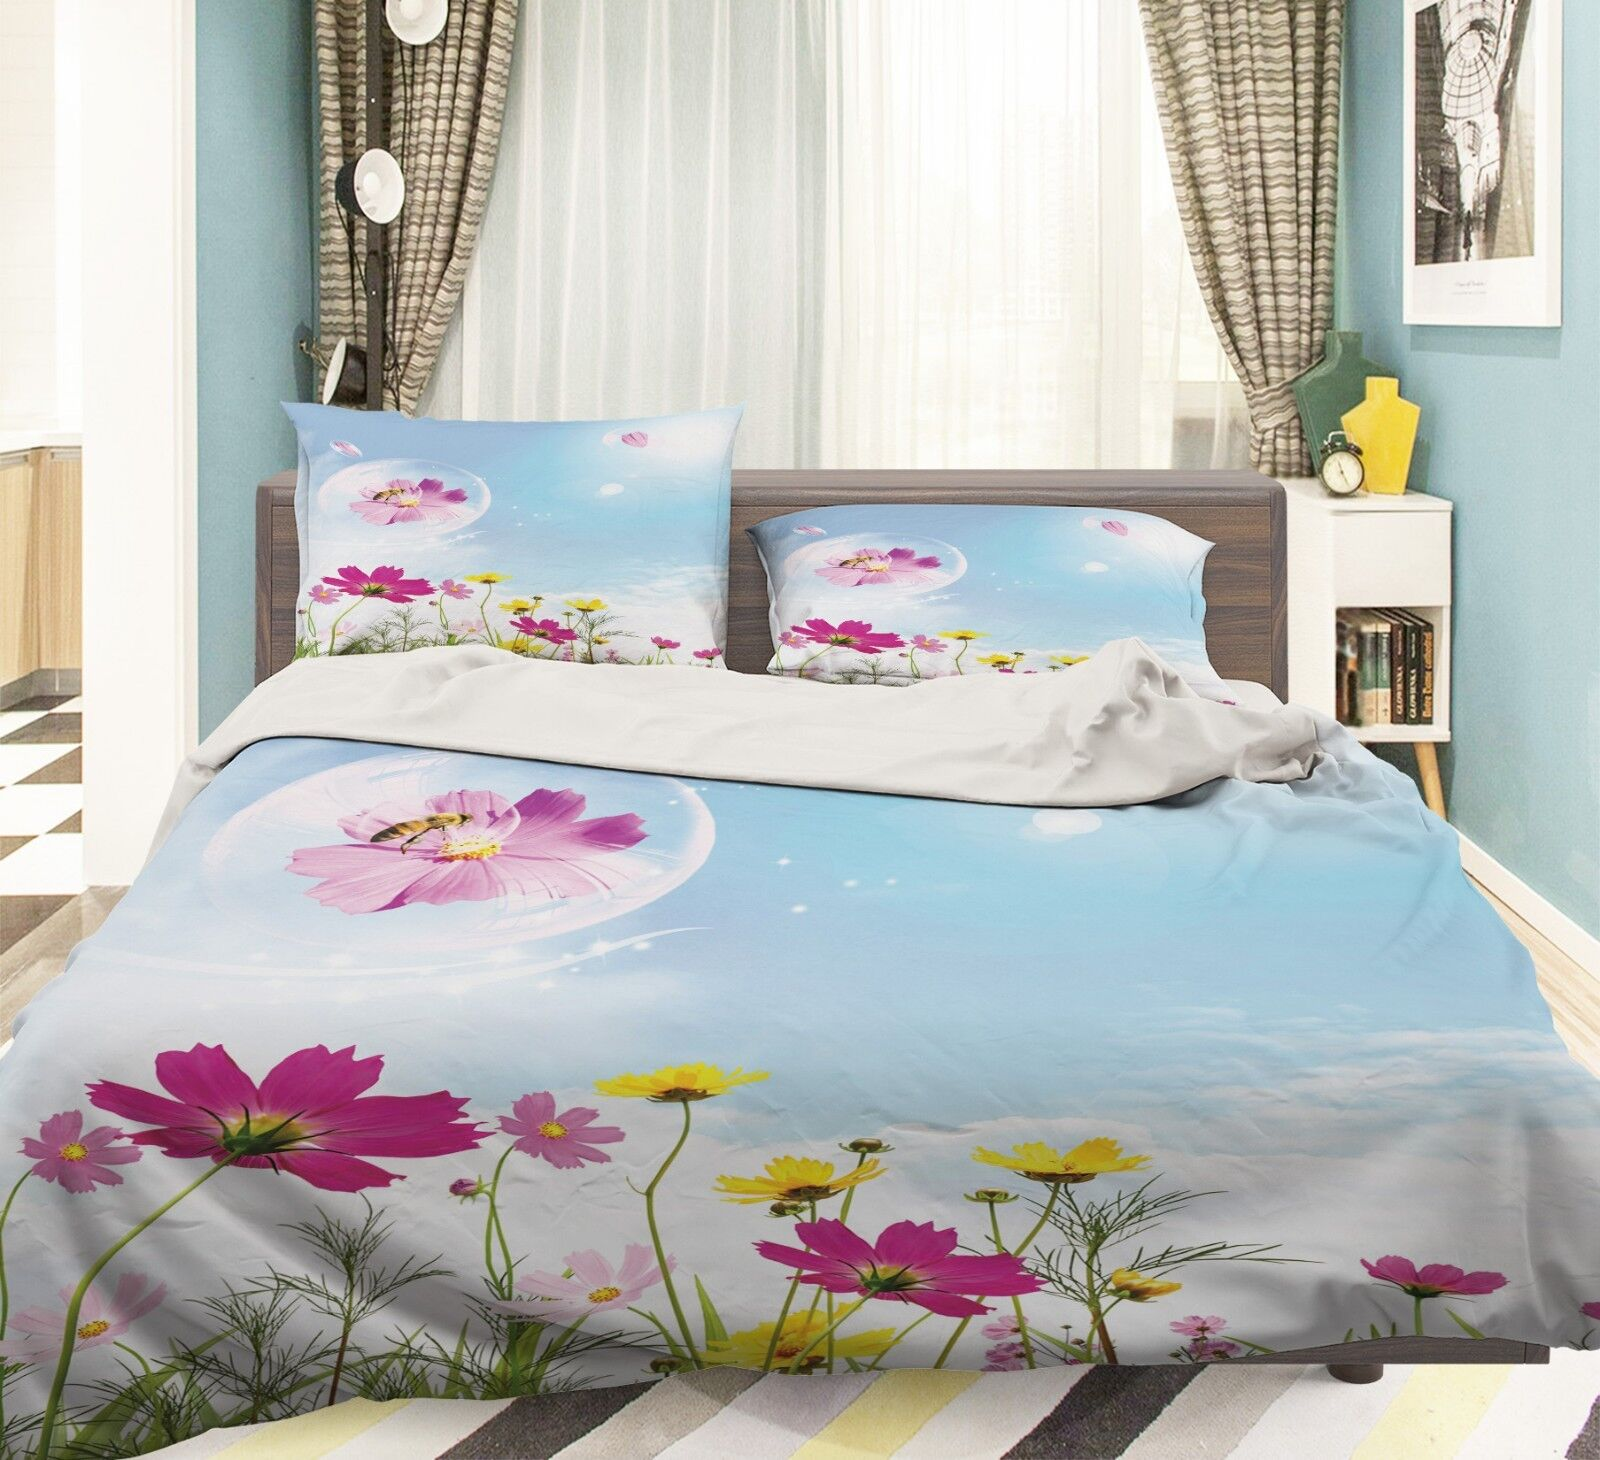 3D Sky Wildflowers 6 Bed Pillowcases Quilt Duvet Cover Set Single King UK Summer